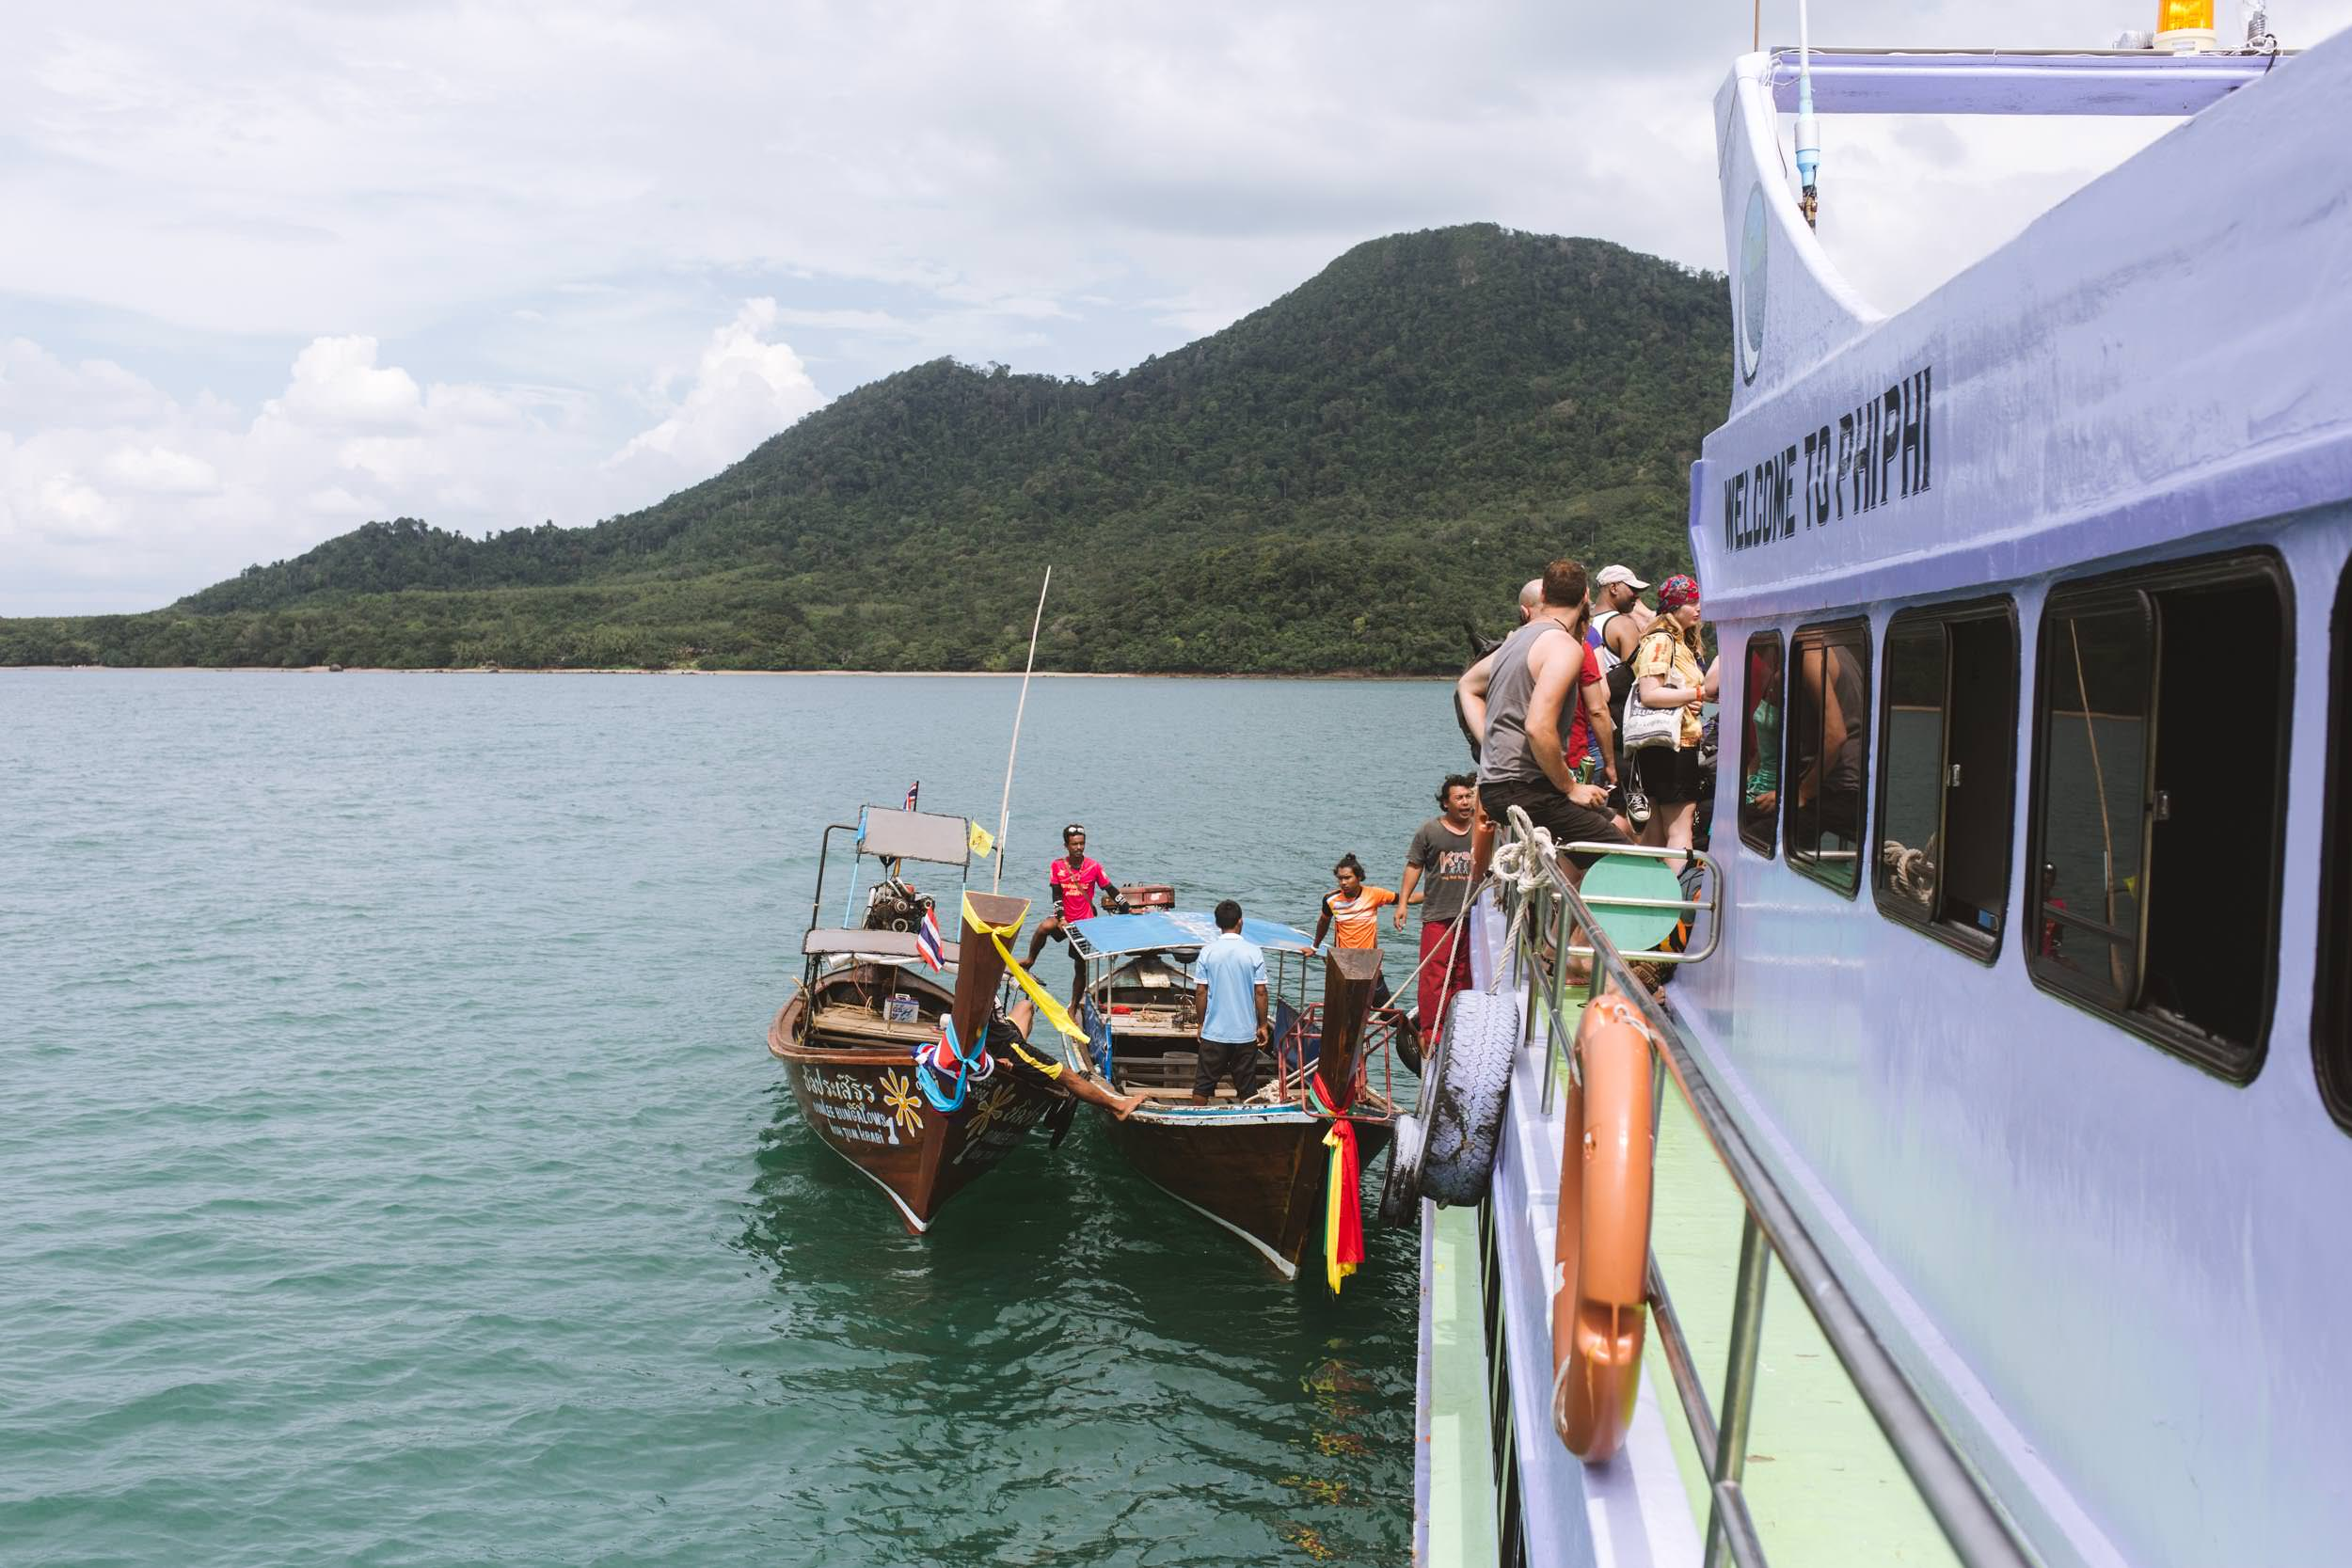 thailand_budget_travel_058.jpg